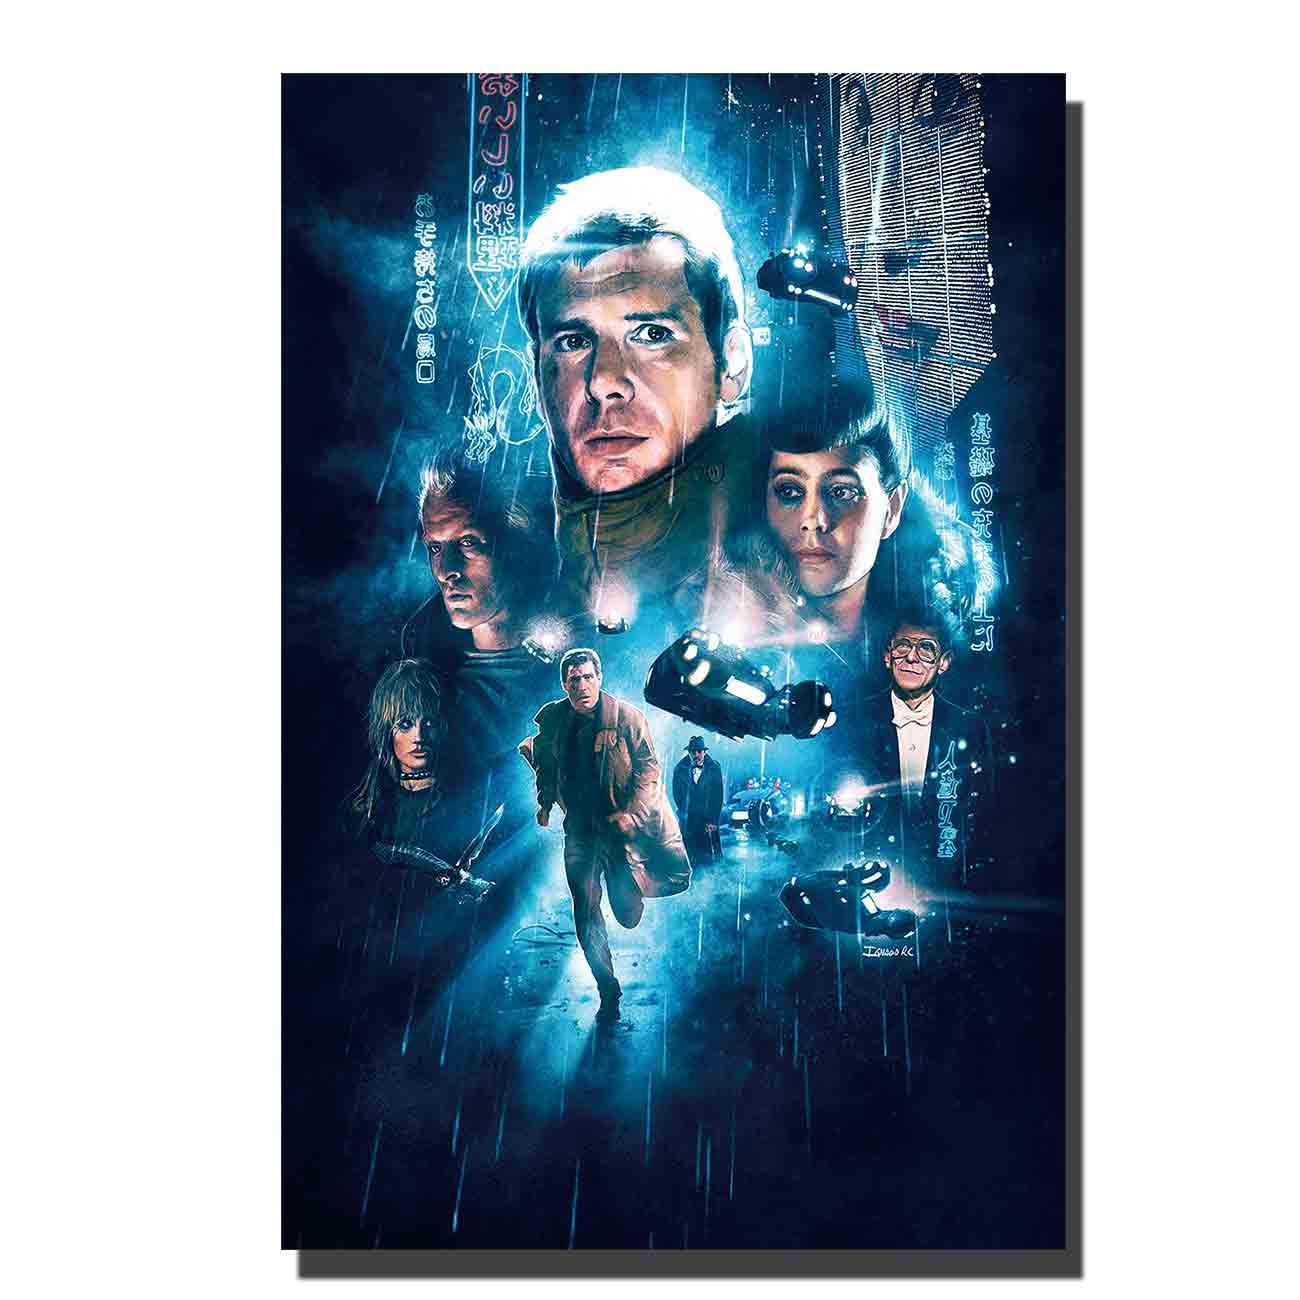 Hot New Blade Runner 2049 2017 Movie Ryan Gosling Silk Canvas Poster 13x20 24x36